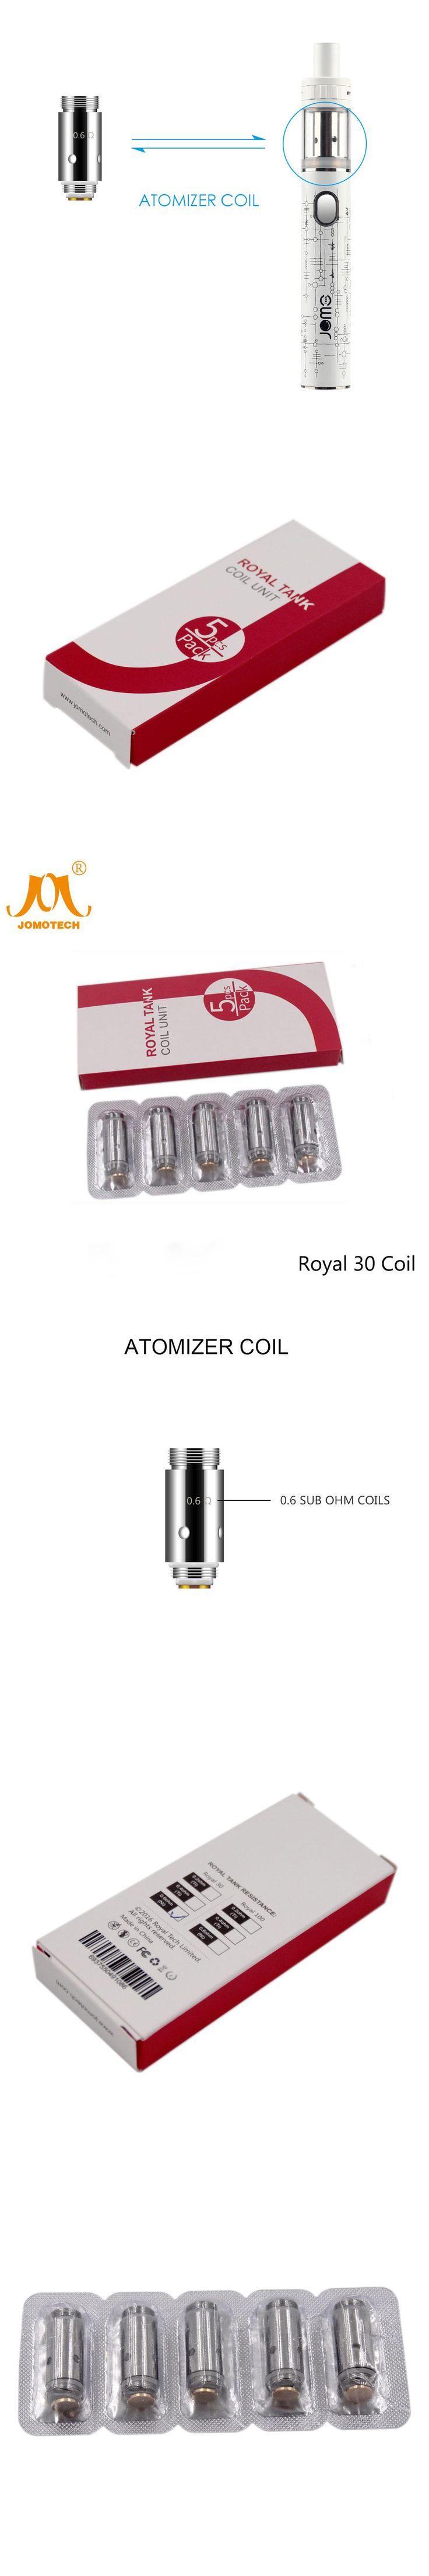 JomoTech Royal 30w Evaporator Electronic Cigarette Atomizer Core Replacement Coil SSOCC 0.6ohm Atomizer Dual Coil Jomo-C11